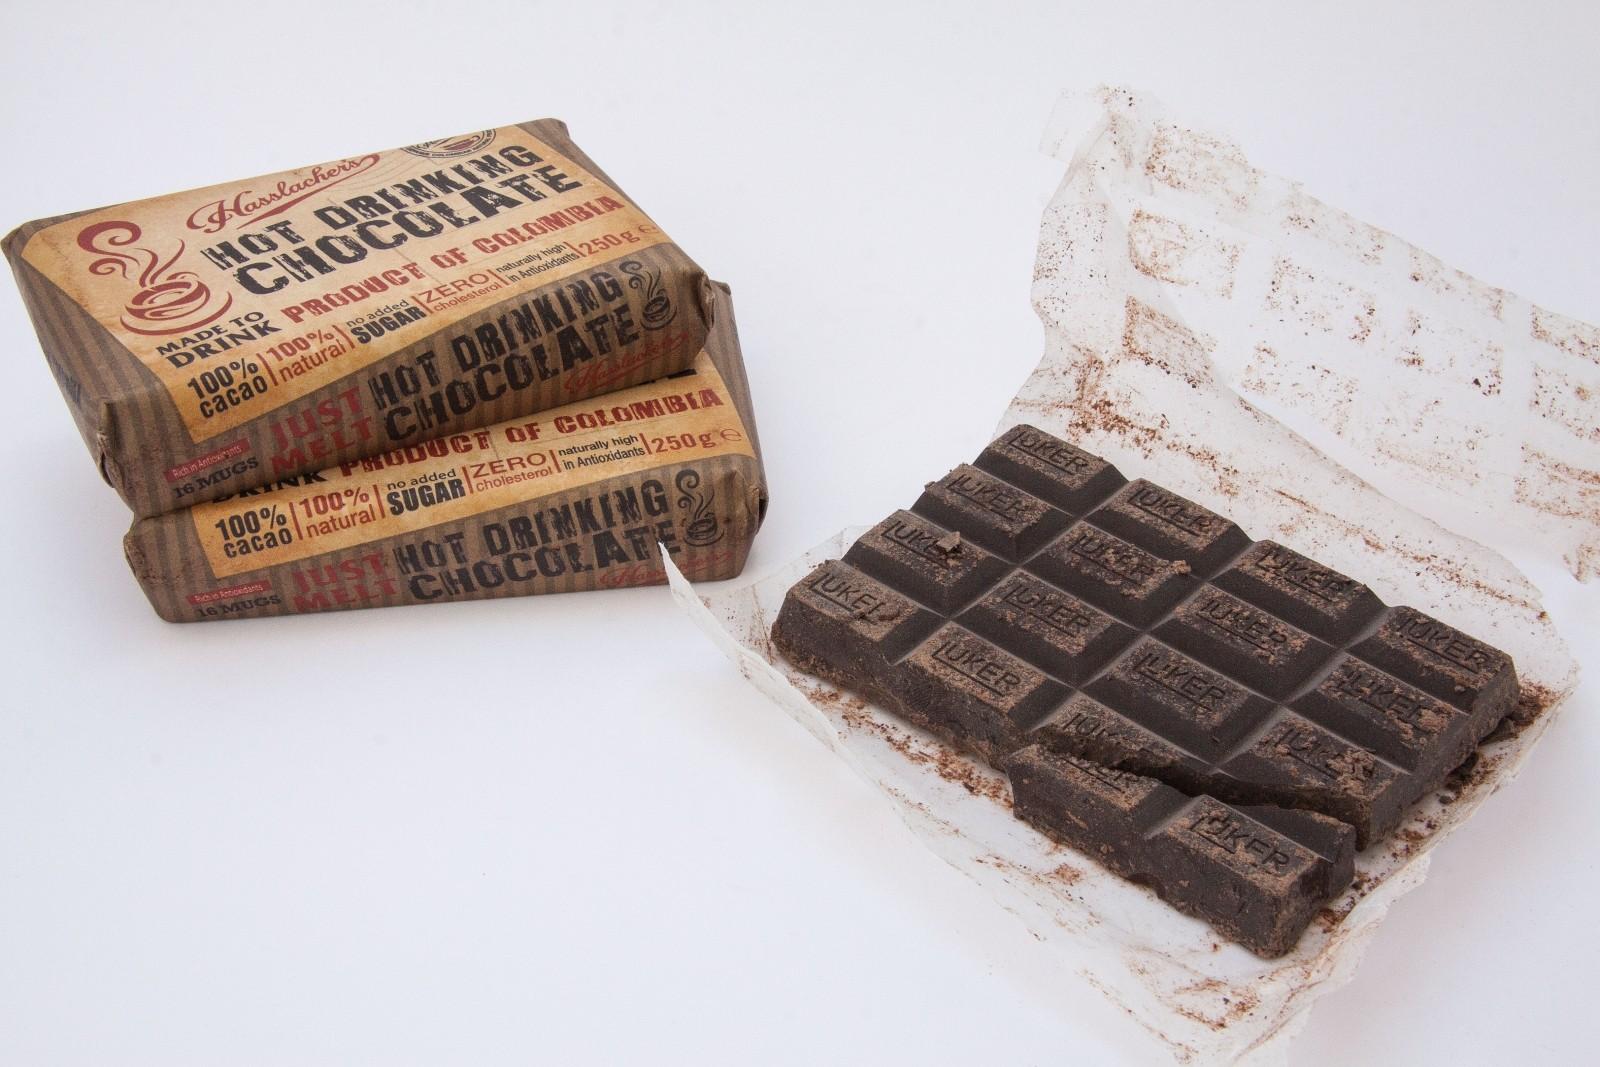 Not everything looks good: optimal packaging design